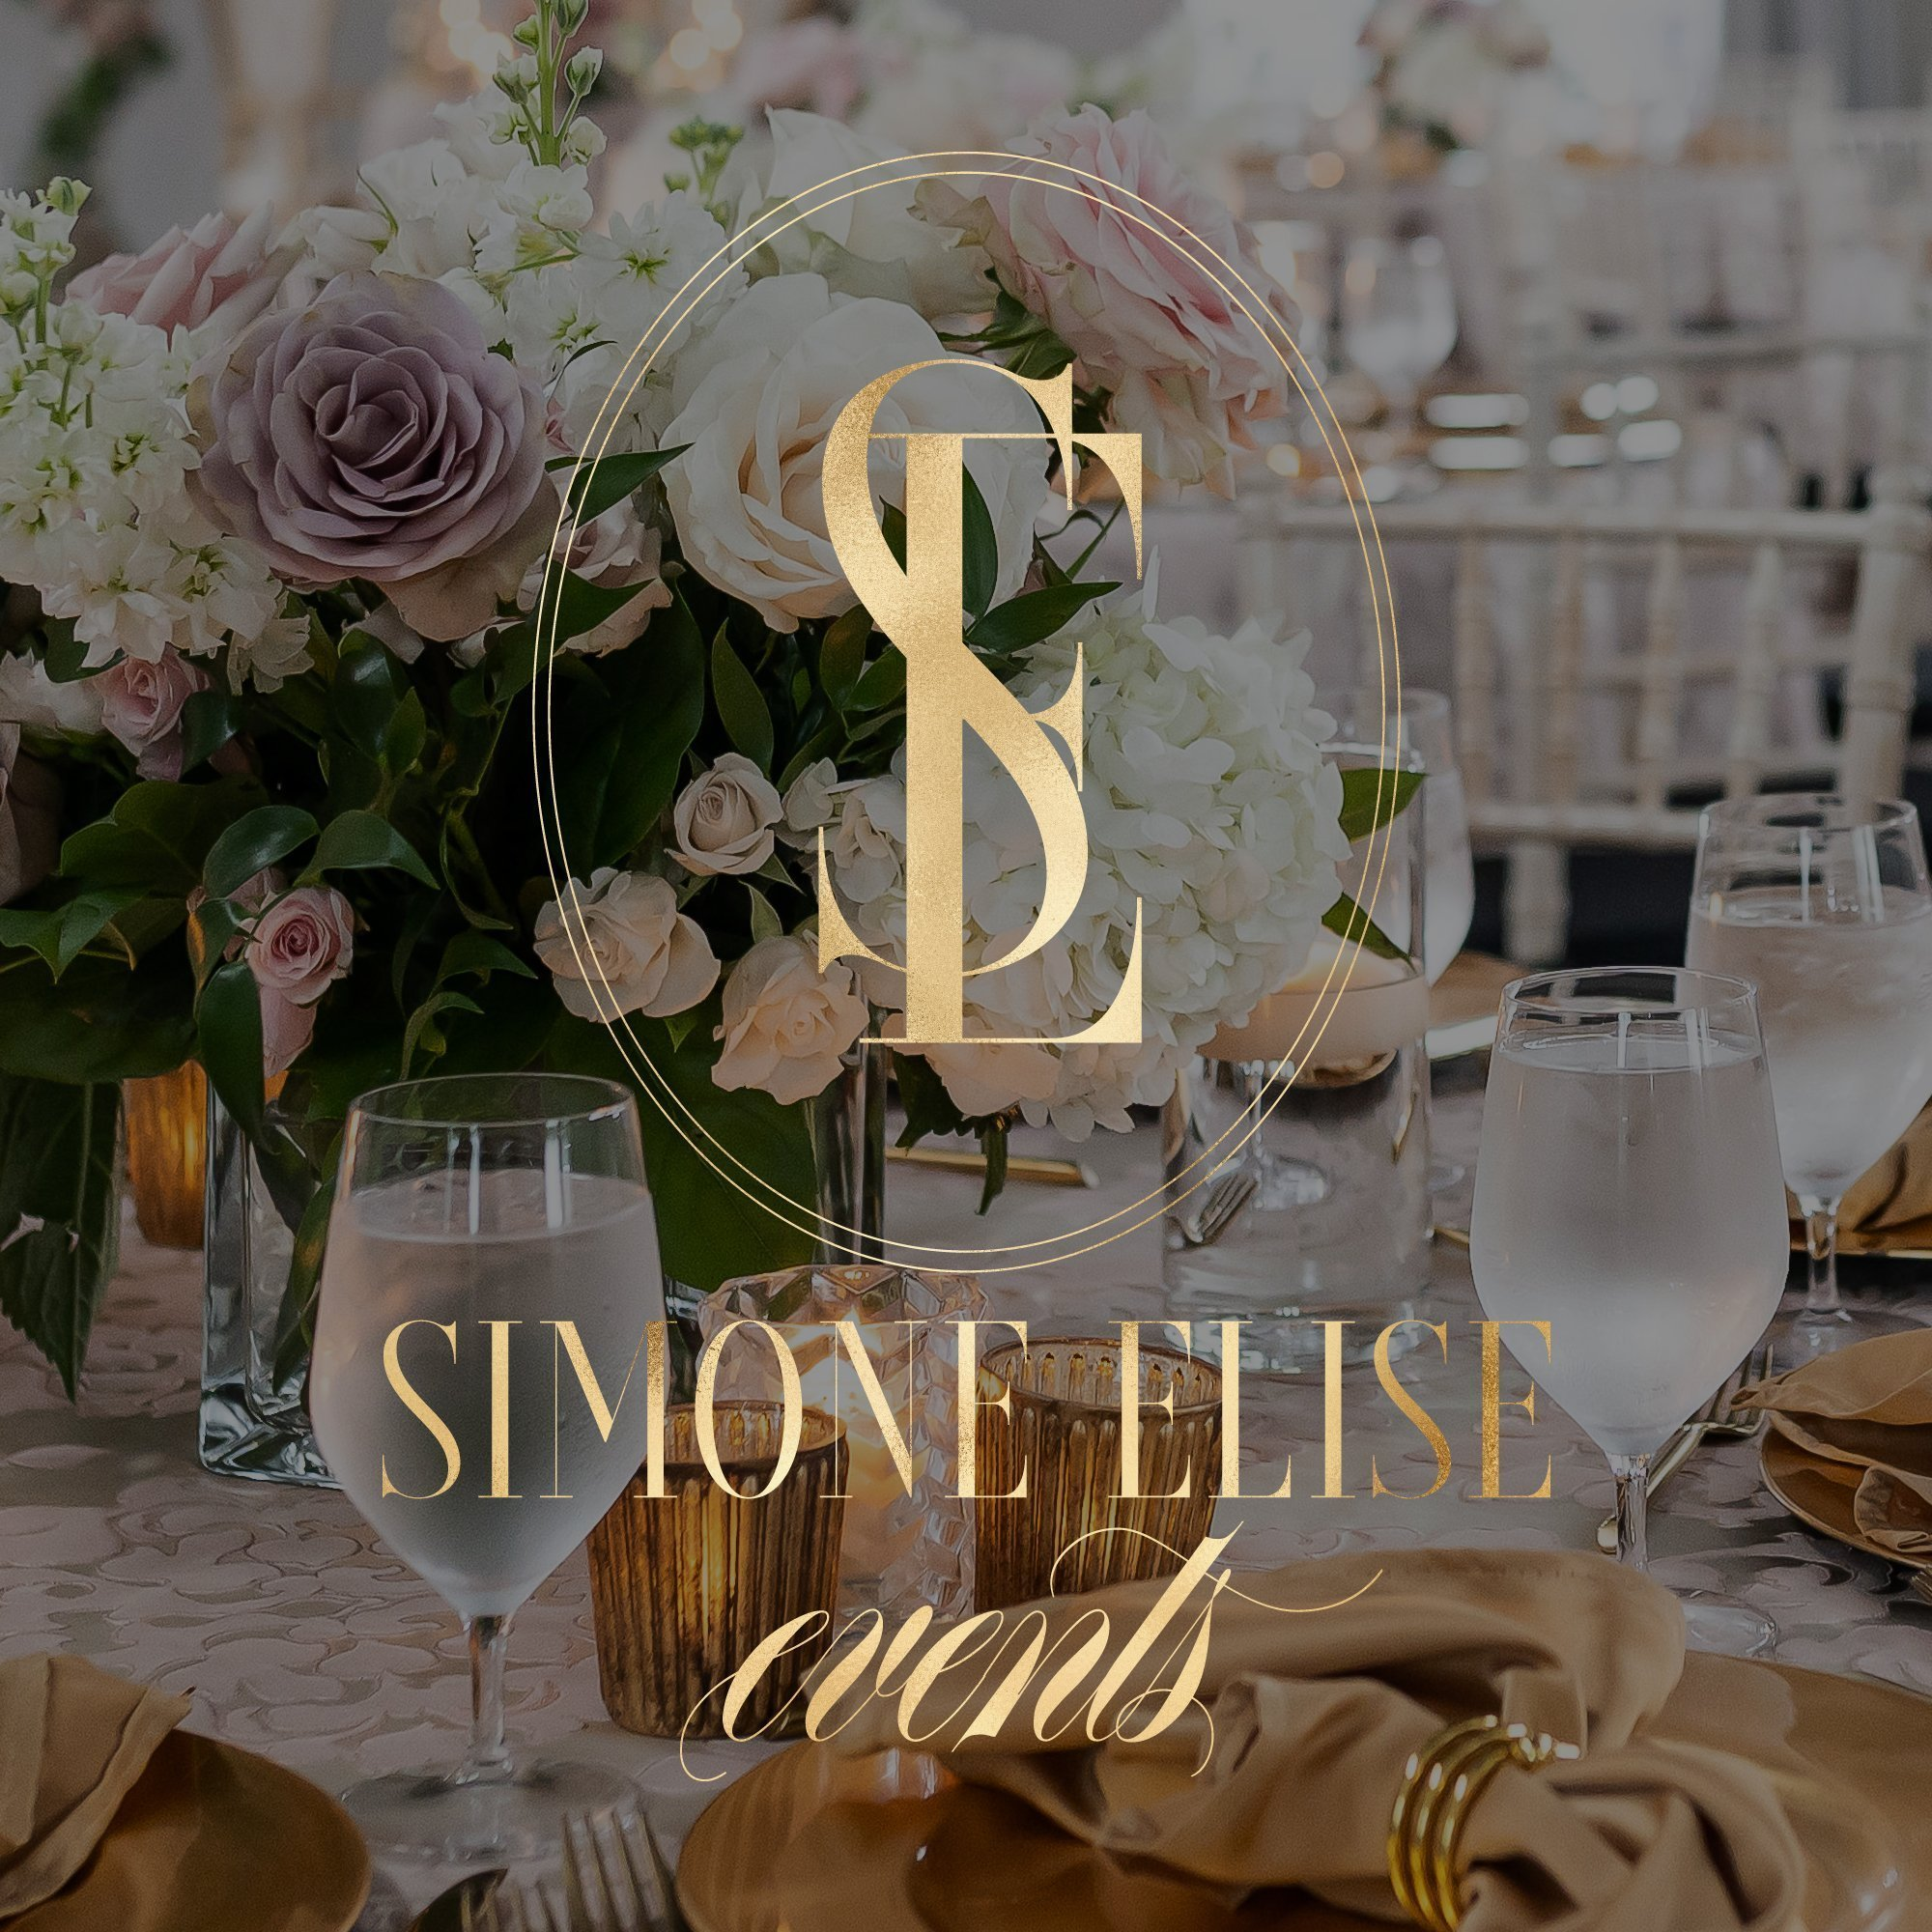 timeless, elegant, upscale logo design for Simone Elise Events in metallic gold